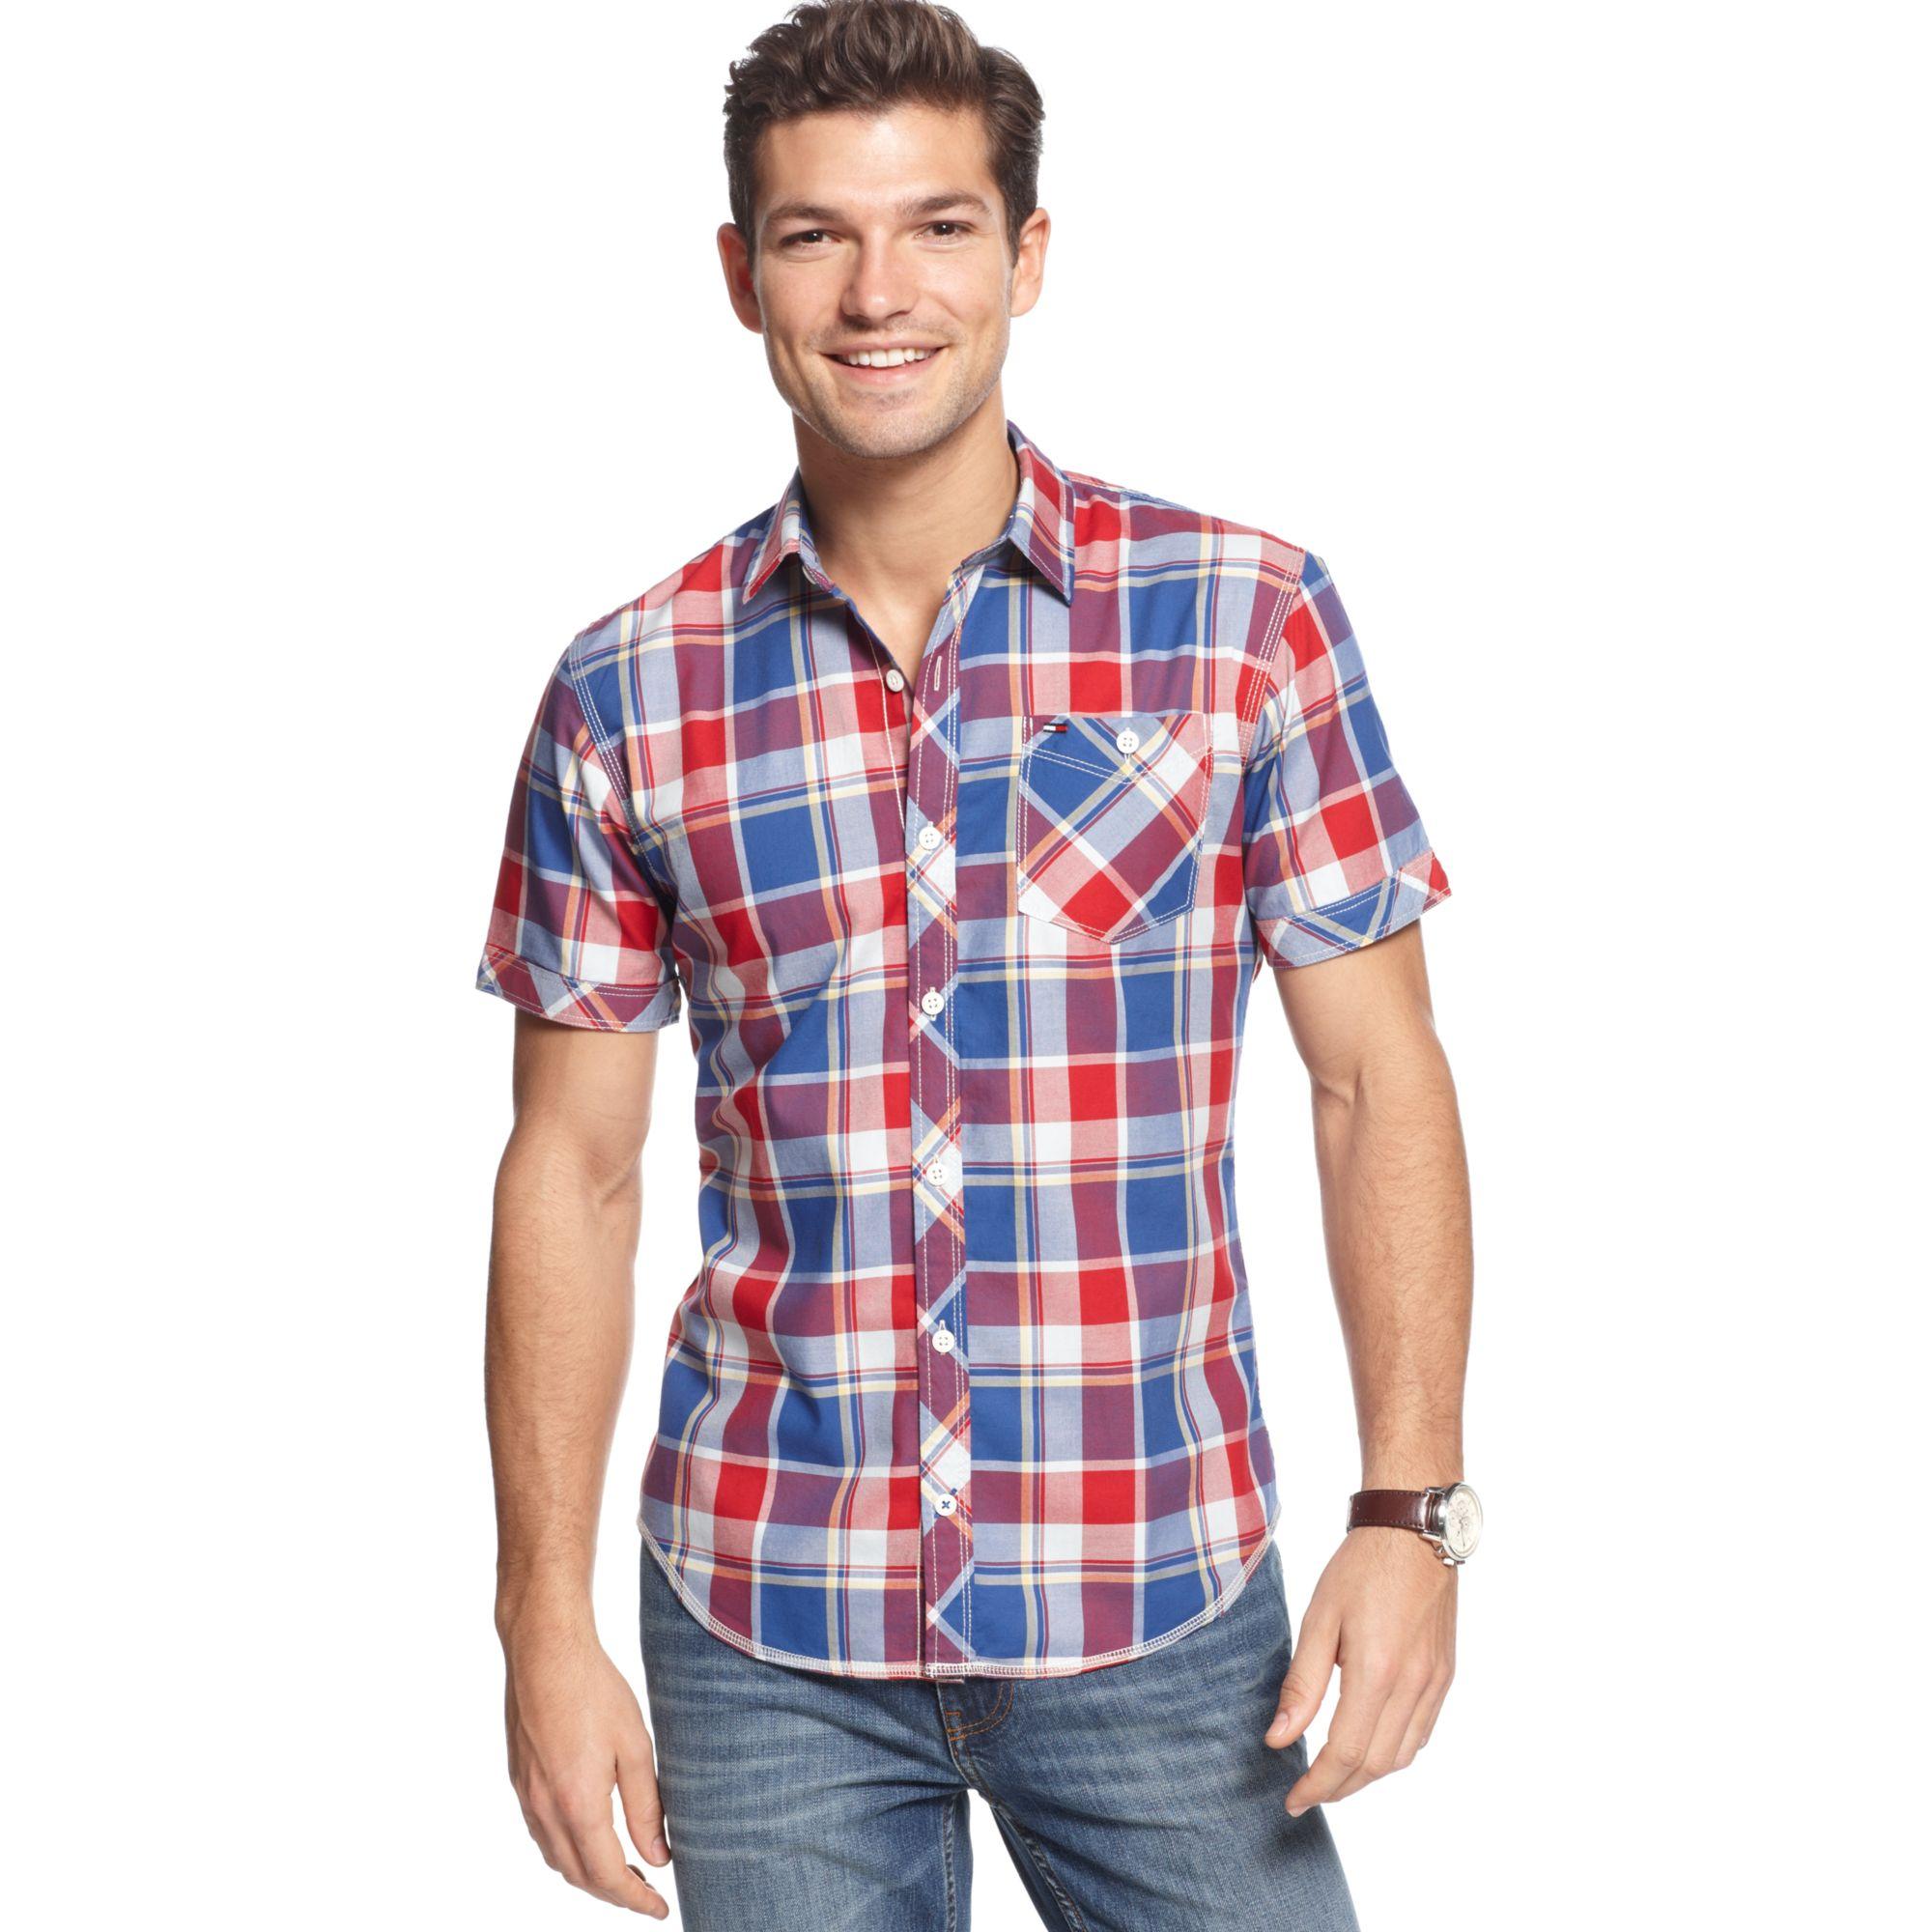 63599924 Tommy Hilfiger Spark Check Shirt Hilfiger Denim Collection in Blue ...